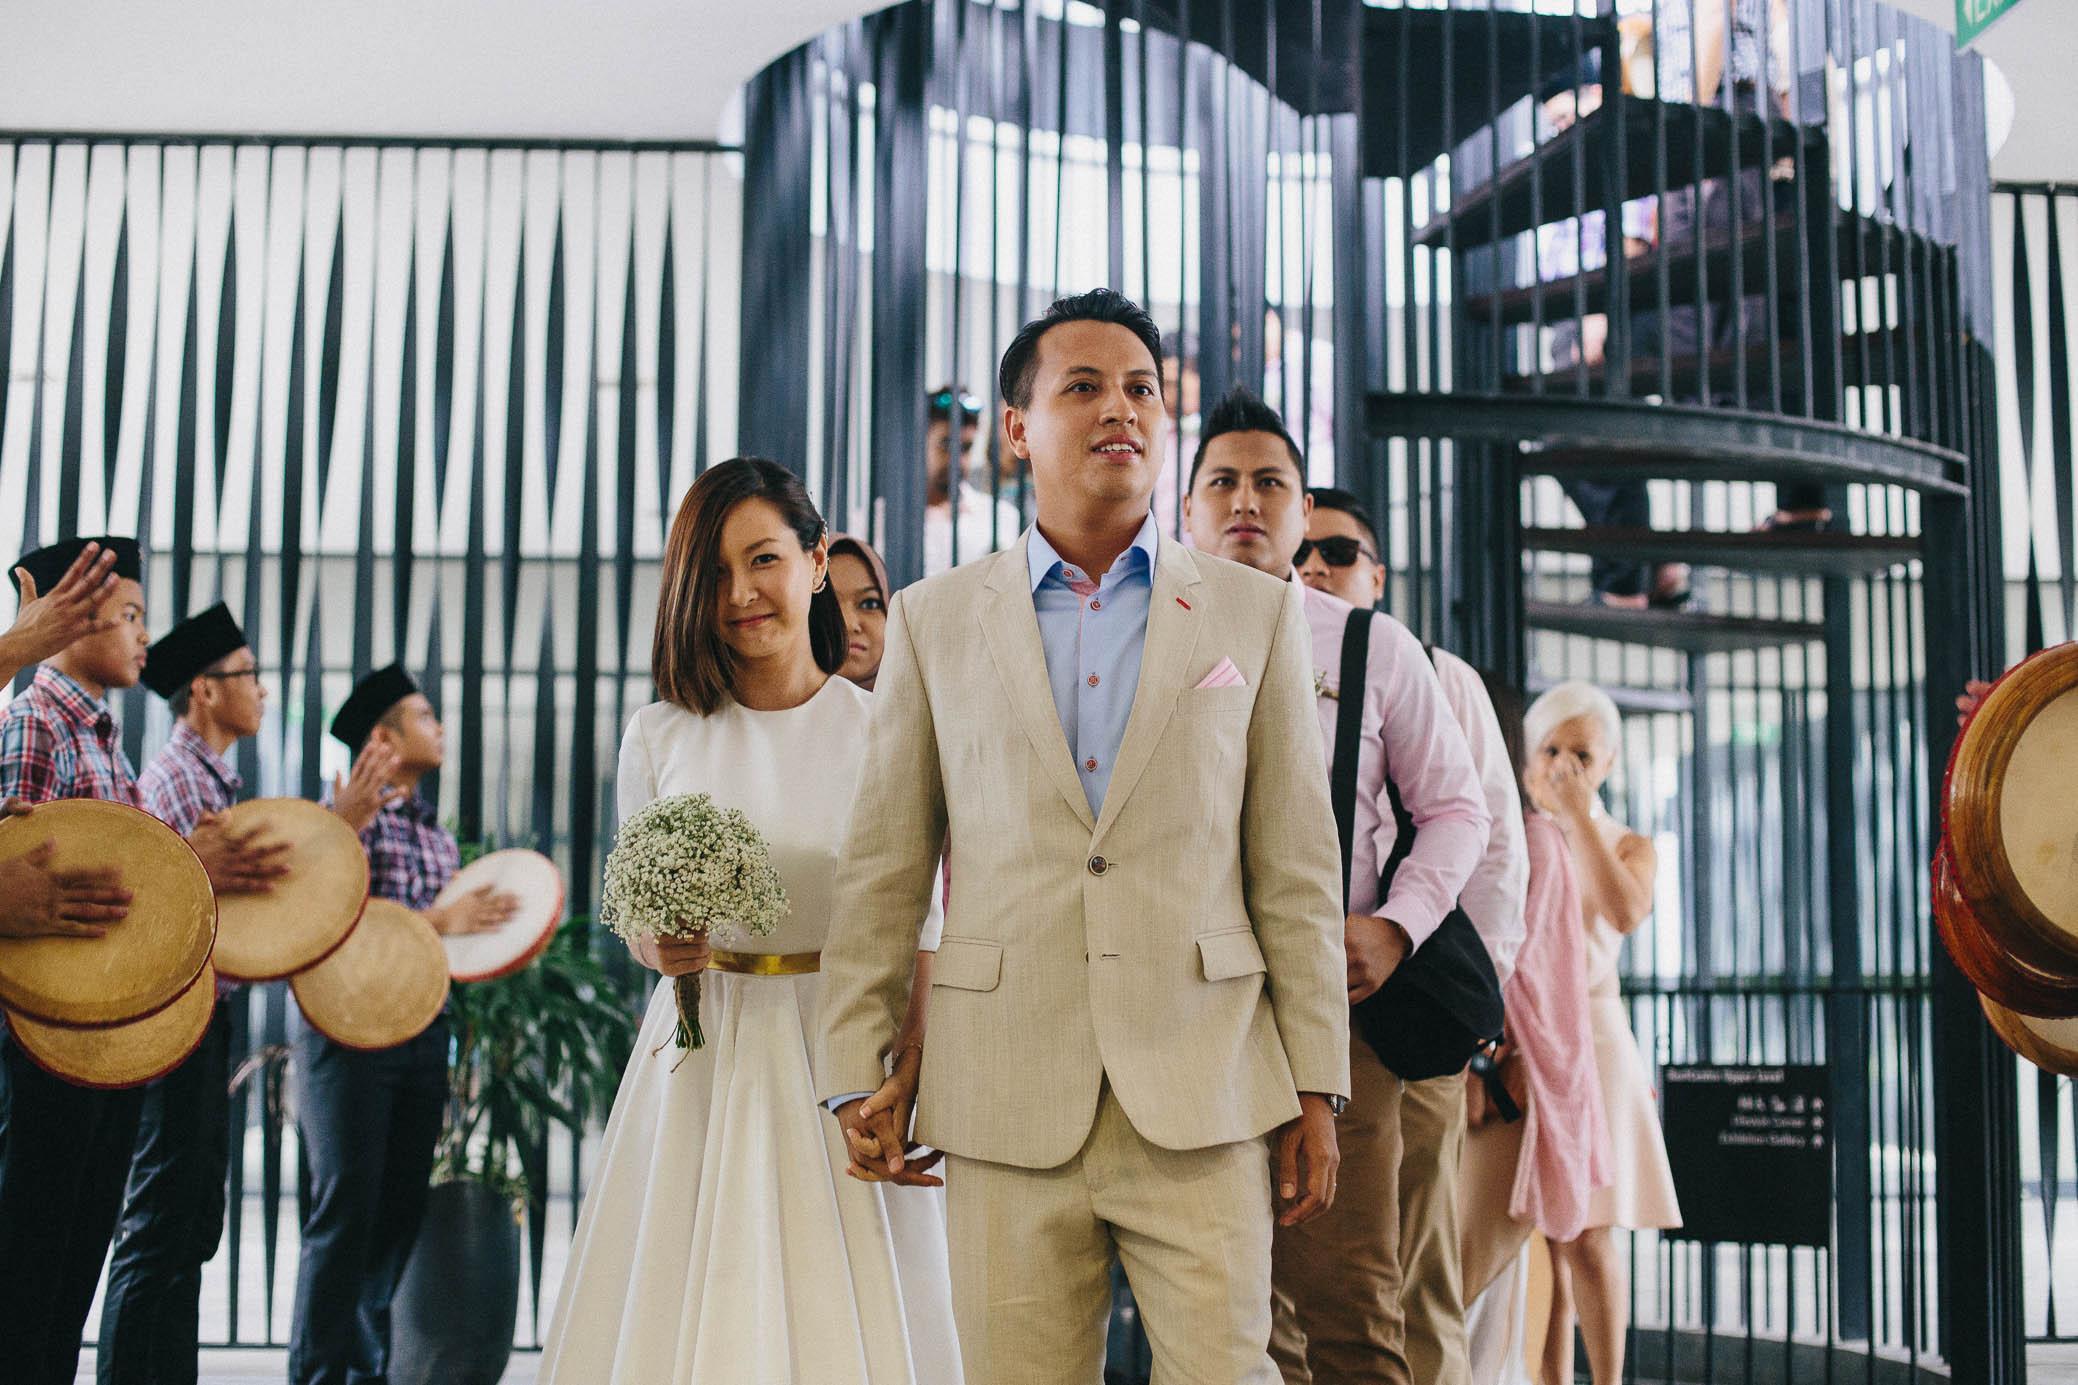 singapore-wedding-photographer-malay-indian-pre-wedding-travel-wmt-2015-alif-ethel-45.jpg